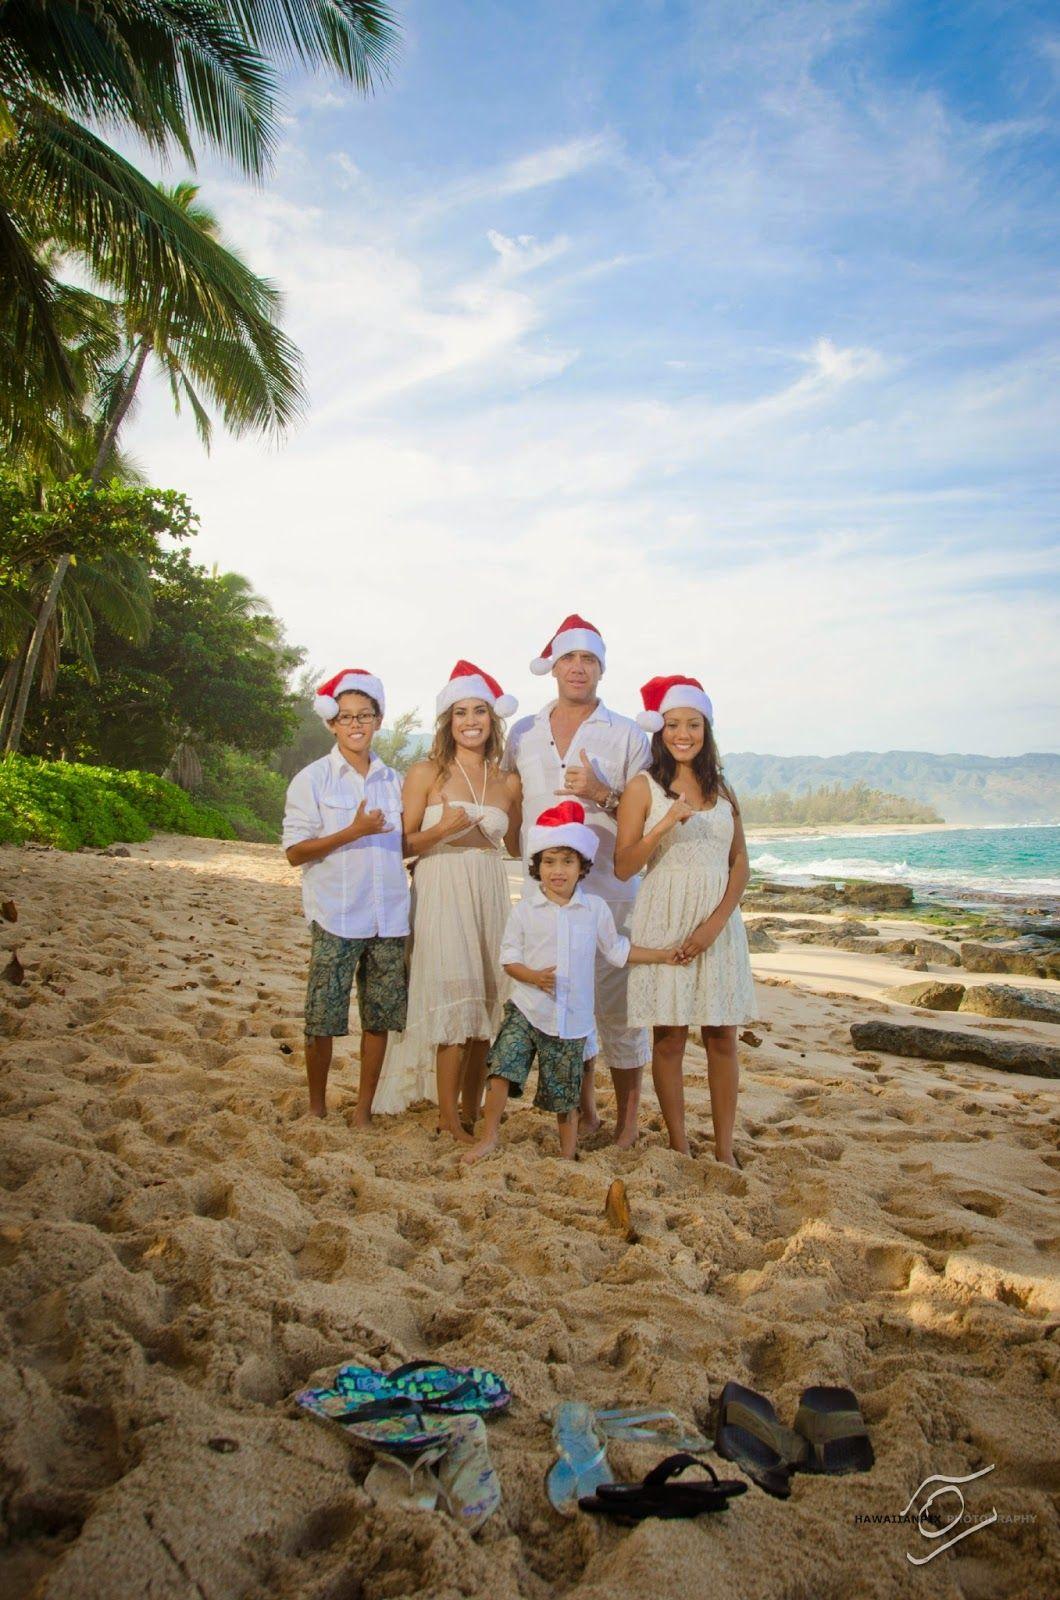 fun ideas for holiday photos, Hawaiian Christmas cards, coordinating ...